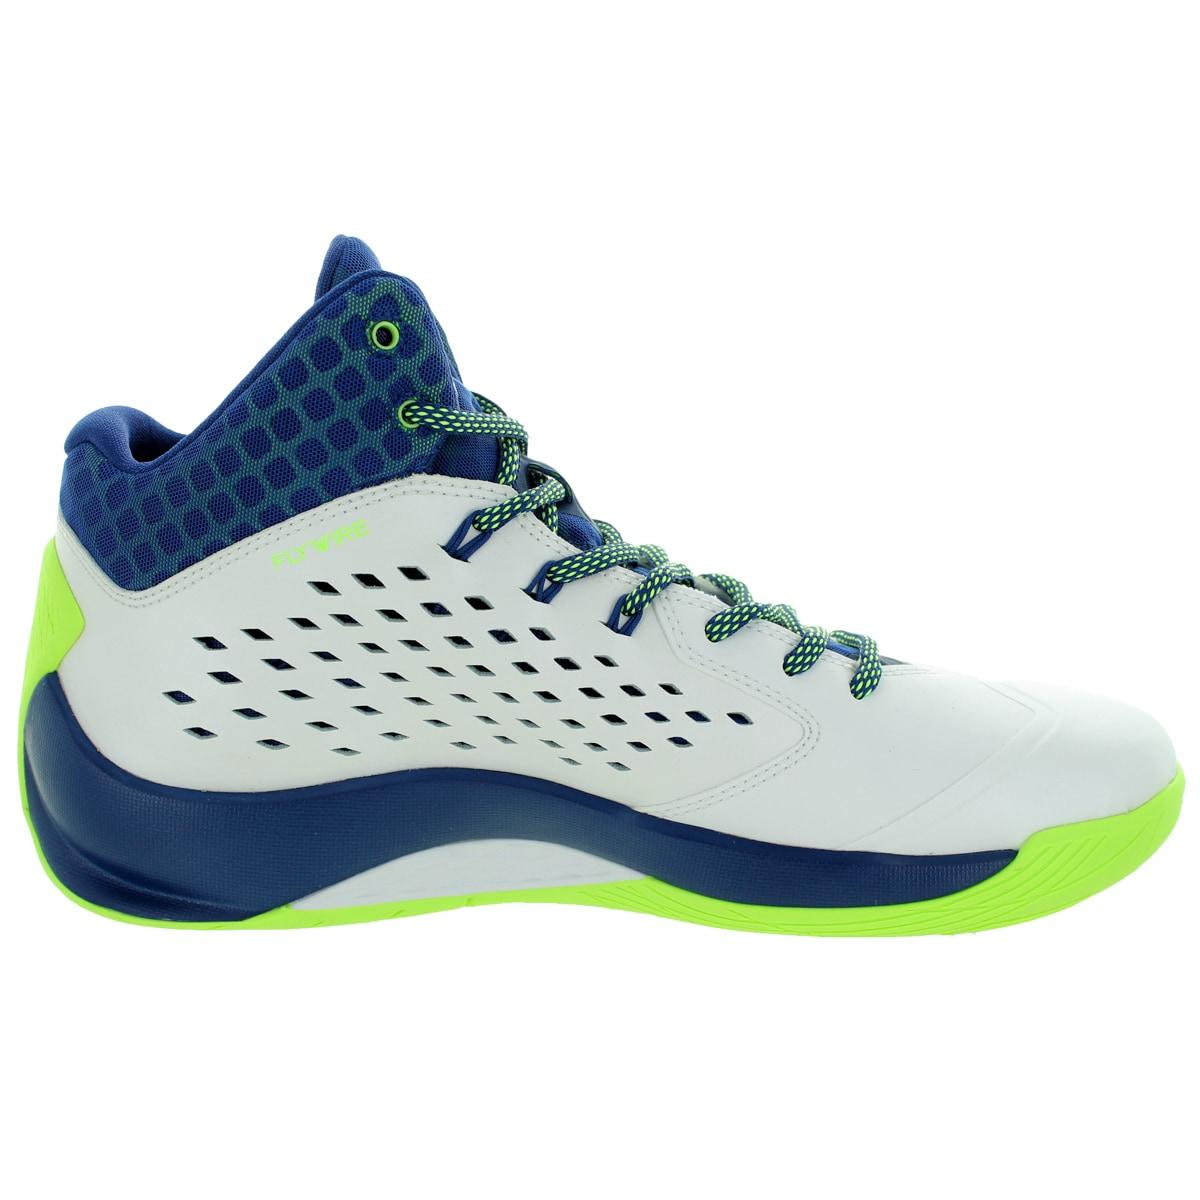 24bc85102df348 Shop Nike Jordan Men s Jordan Rising High White Green Insgn Bl Infrrd 2  Basketball Shoe - Free Shipping Today - Overstock - 12318365